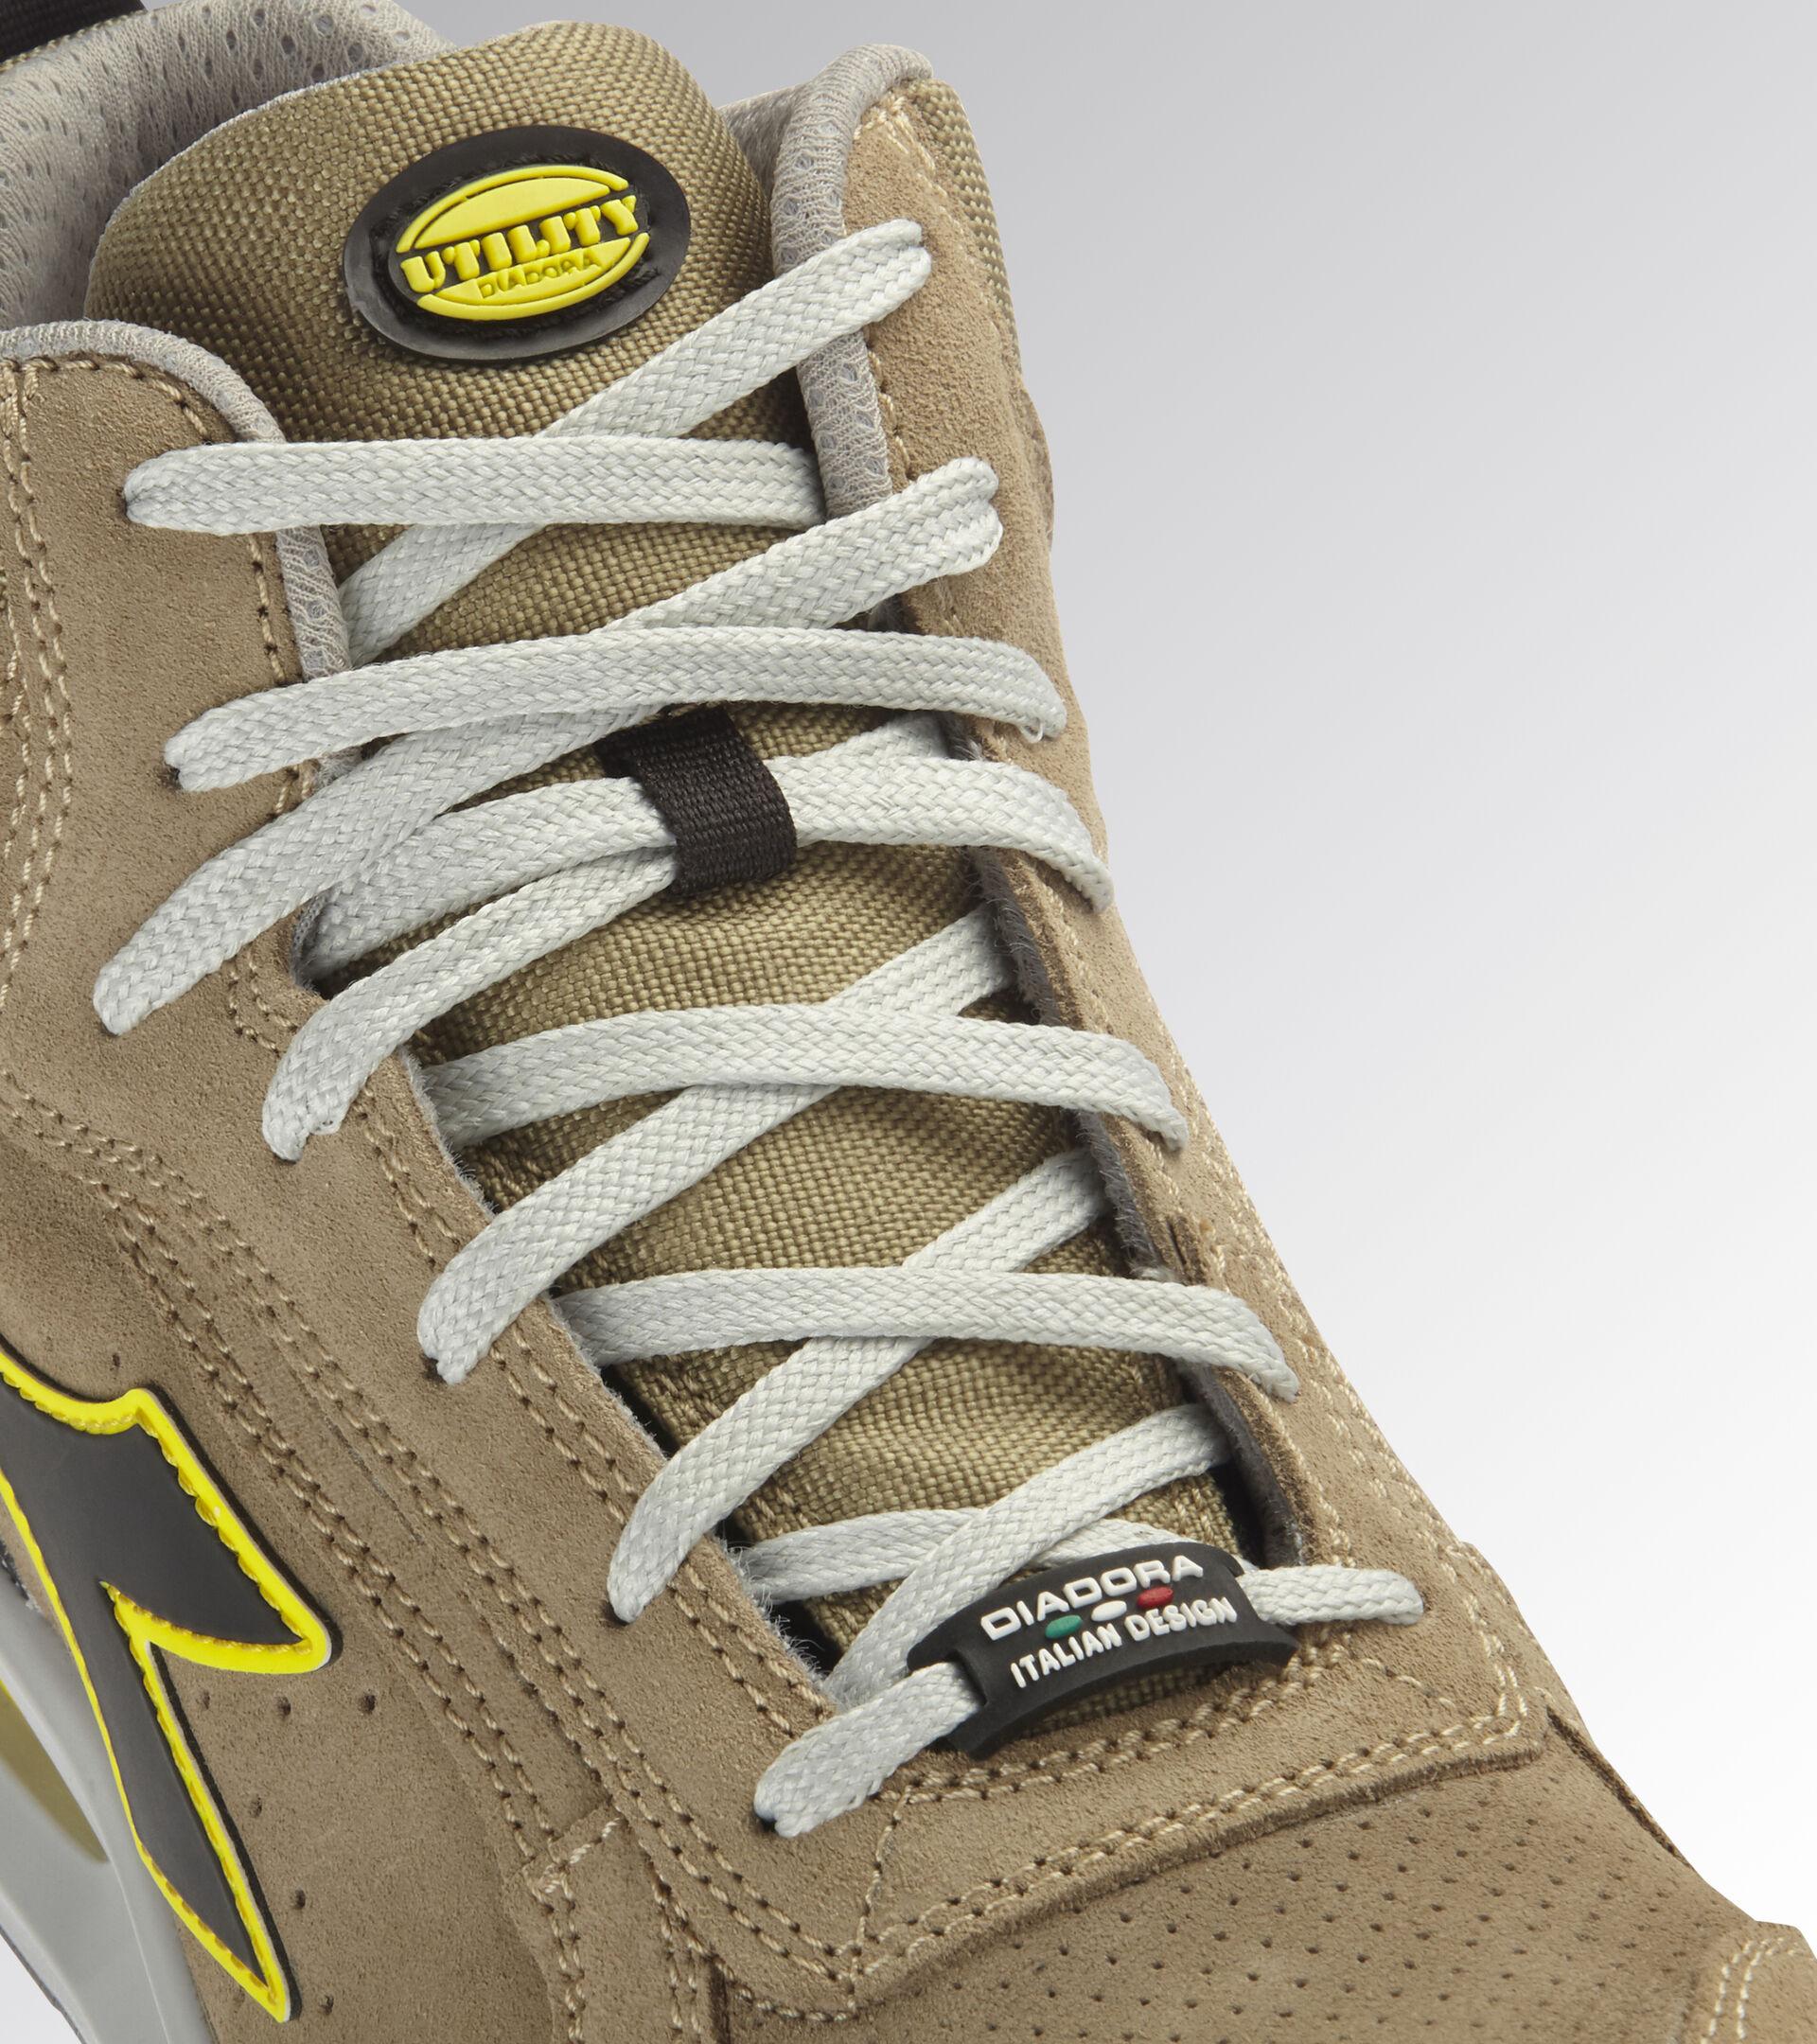 Footwear Utility UNISEX RUN NET AIRBOX MID S1P SRC MOON ROCK GRAY/MOON ROCK GRAY Utility